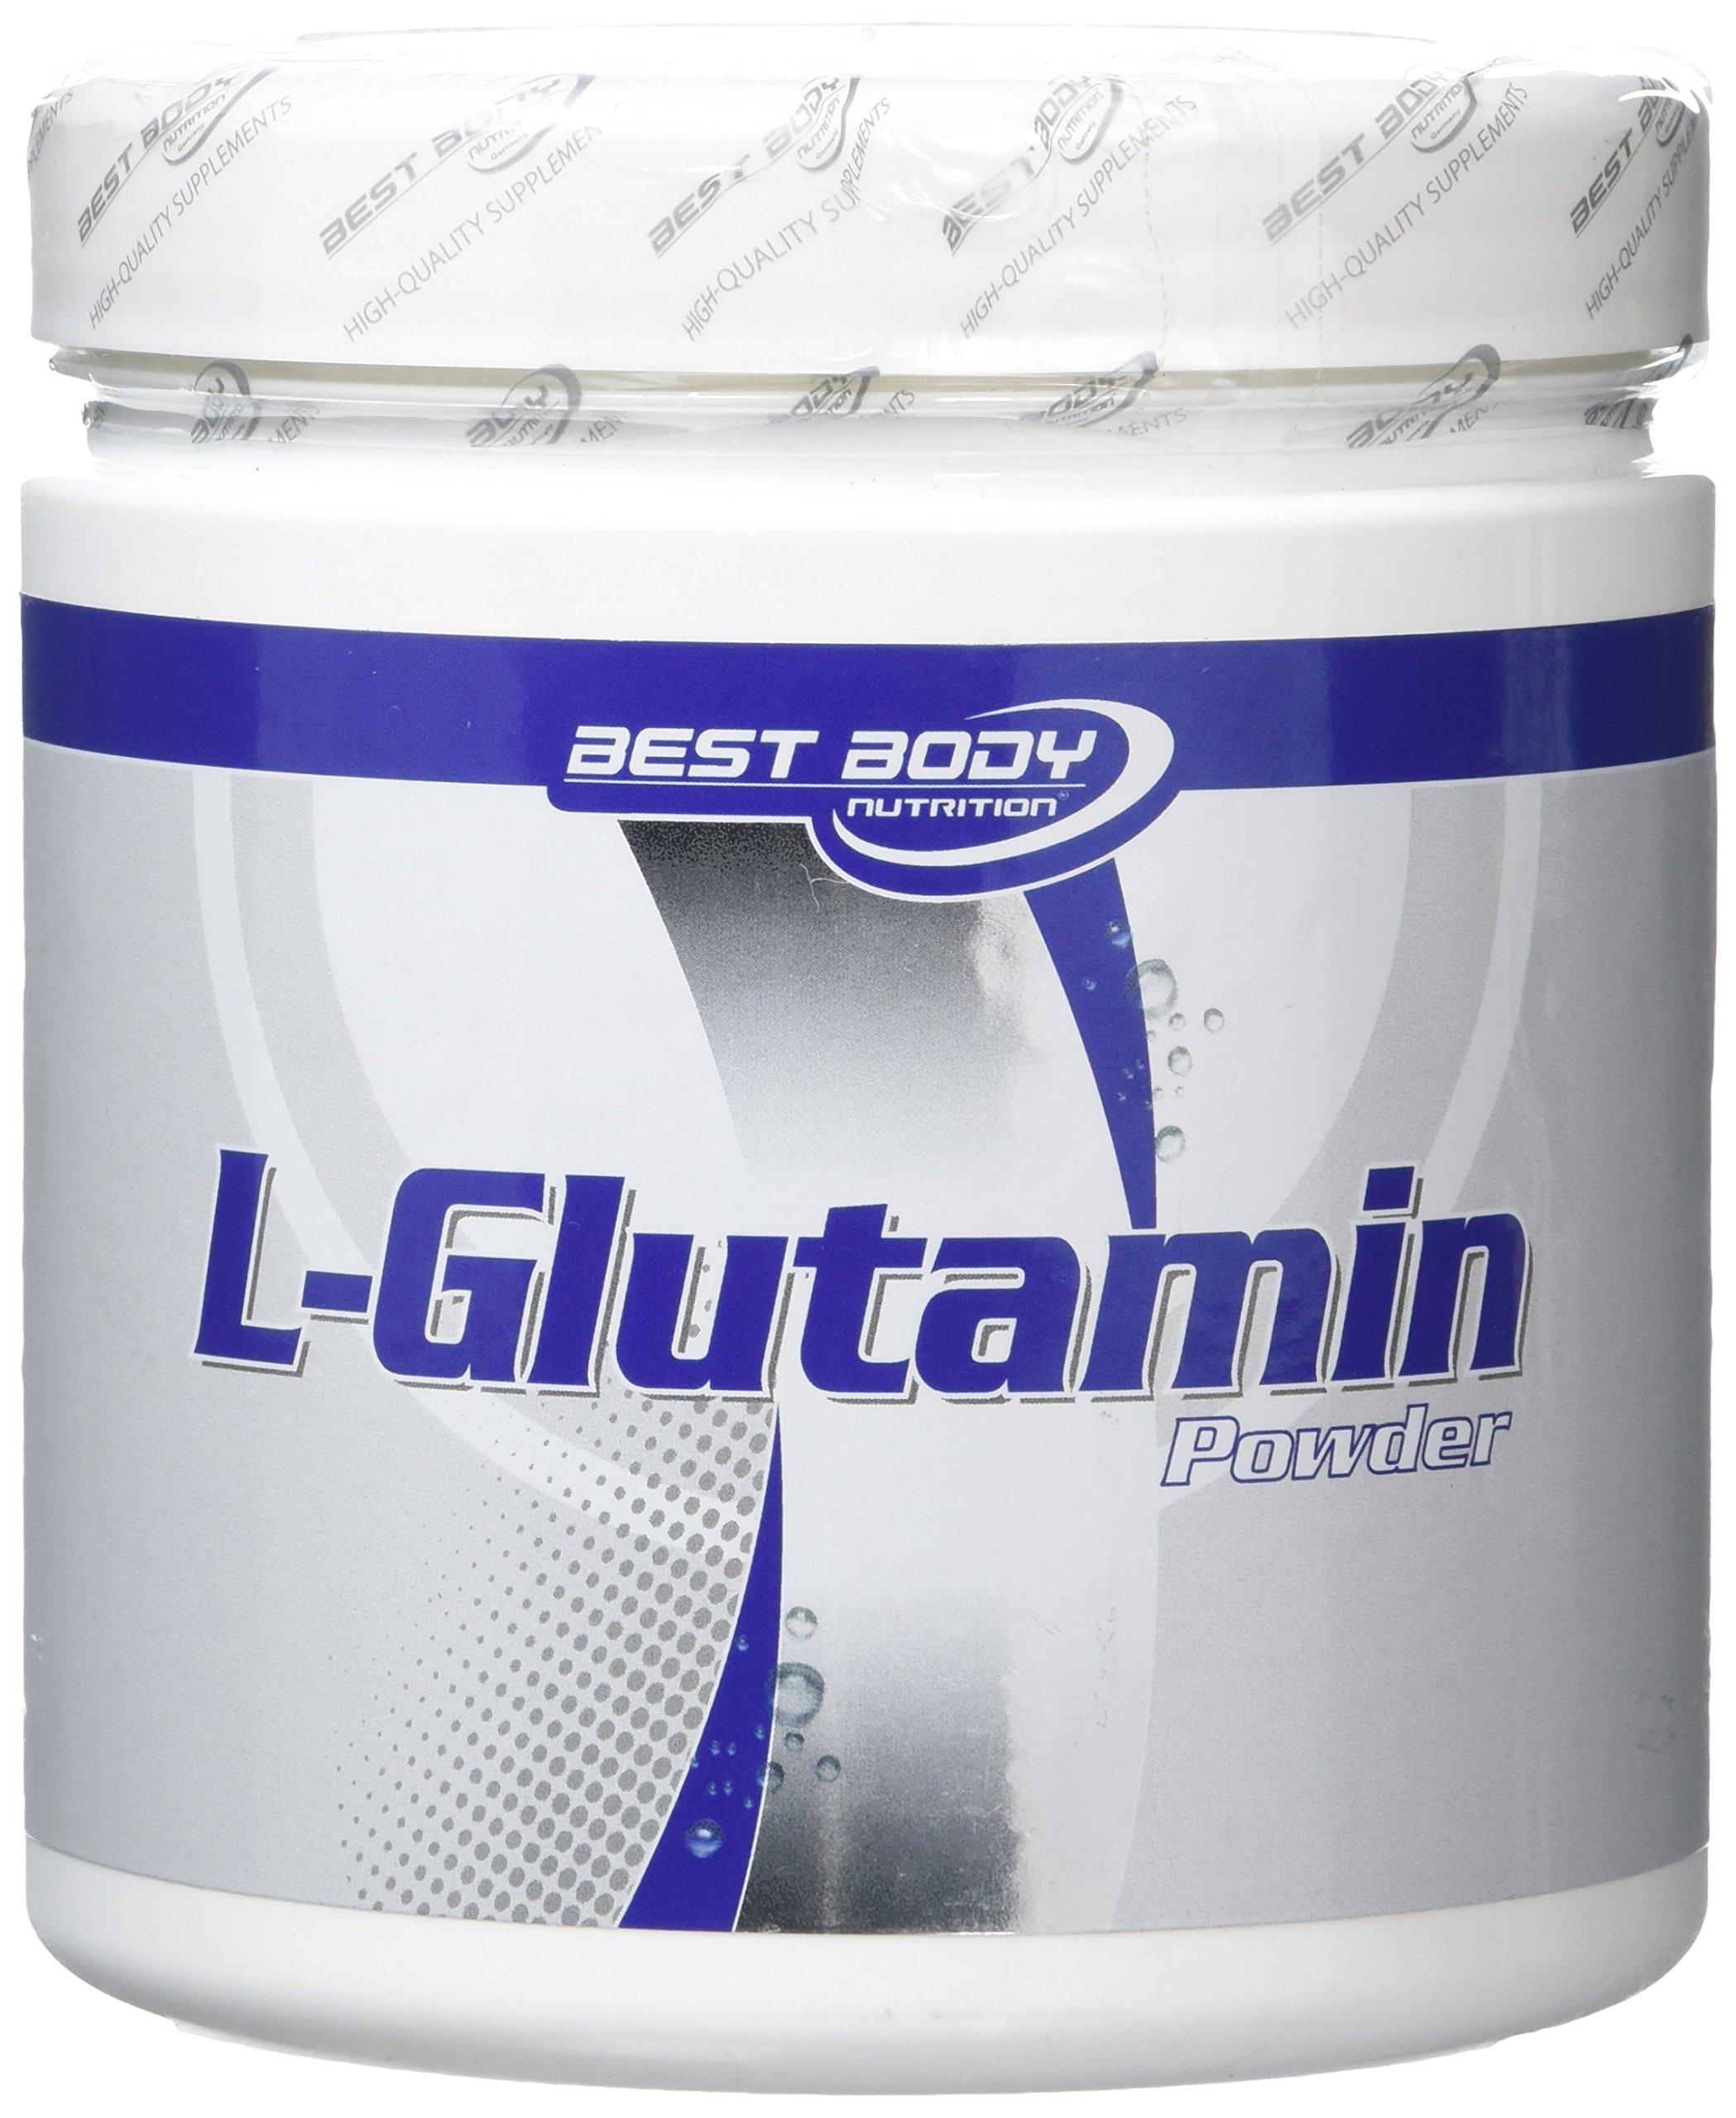 91lvWbbcPlL - Best Body Nutrition Amino Acids L-Glutamine Powder - 250g, 250g